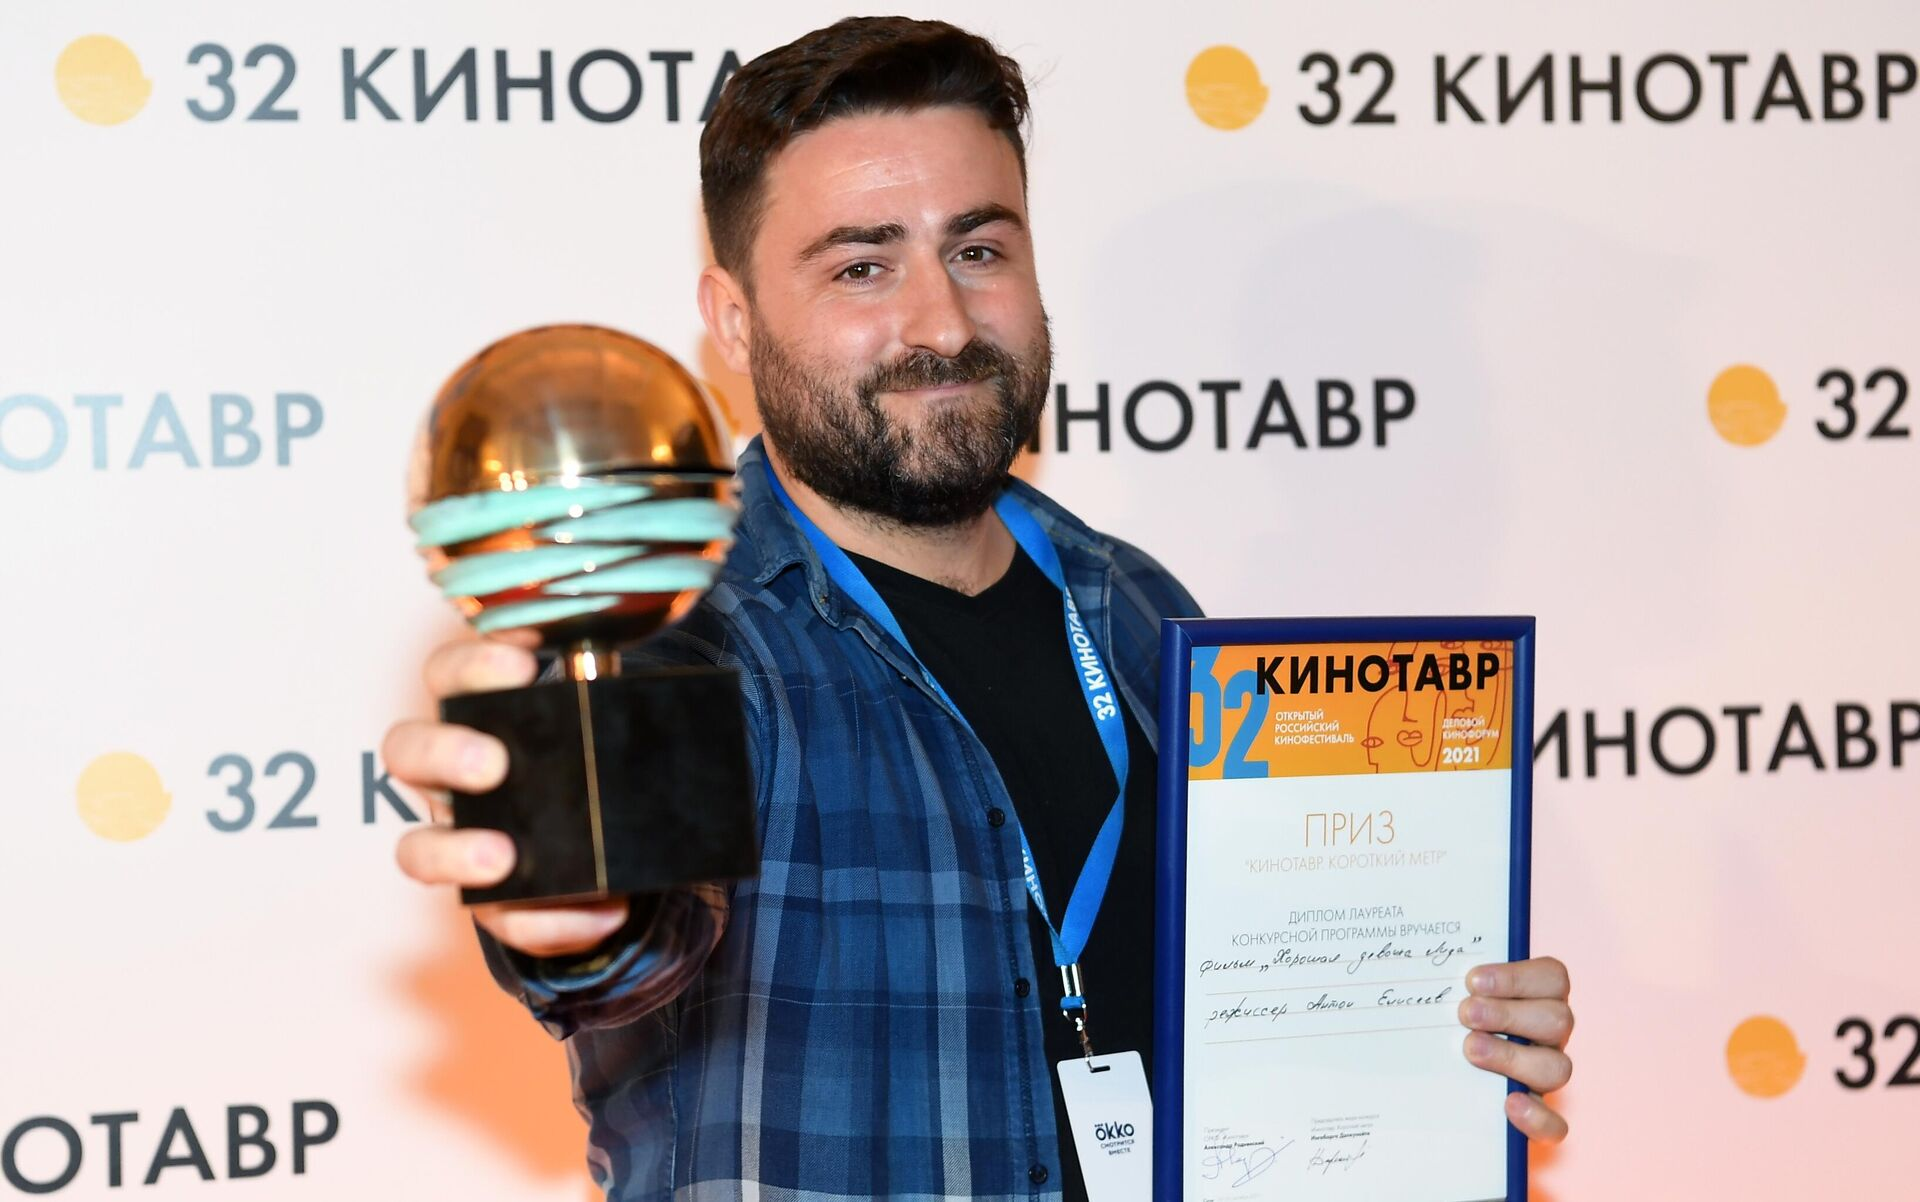 Режиссер Антон Елисеев - Sputnik Беларусь, 1920, 25.09.2021